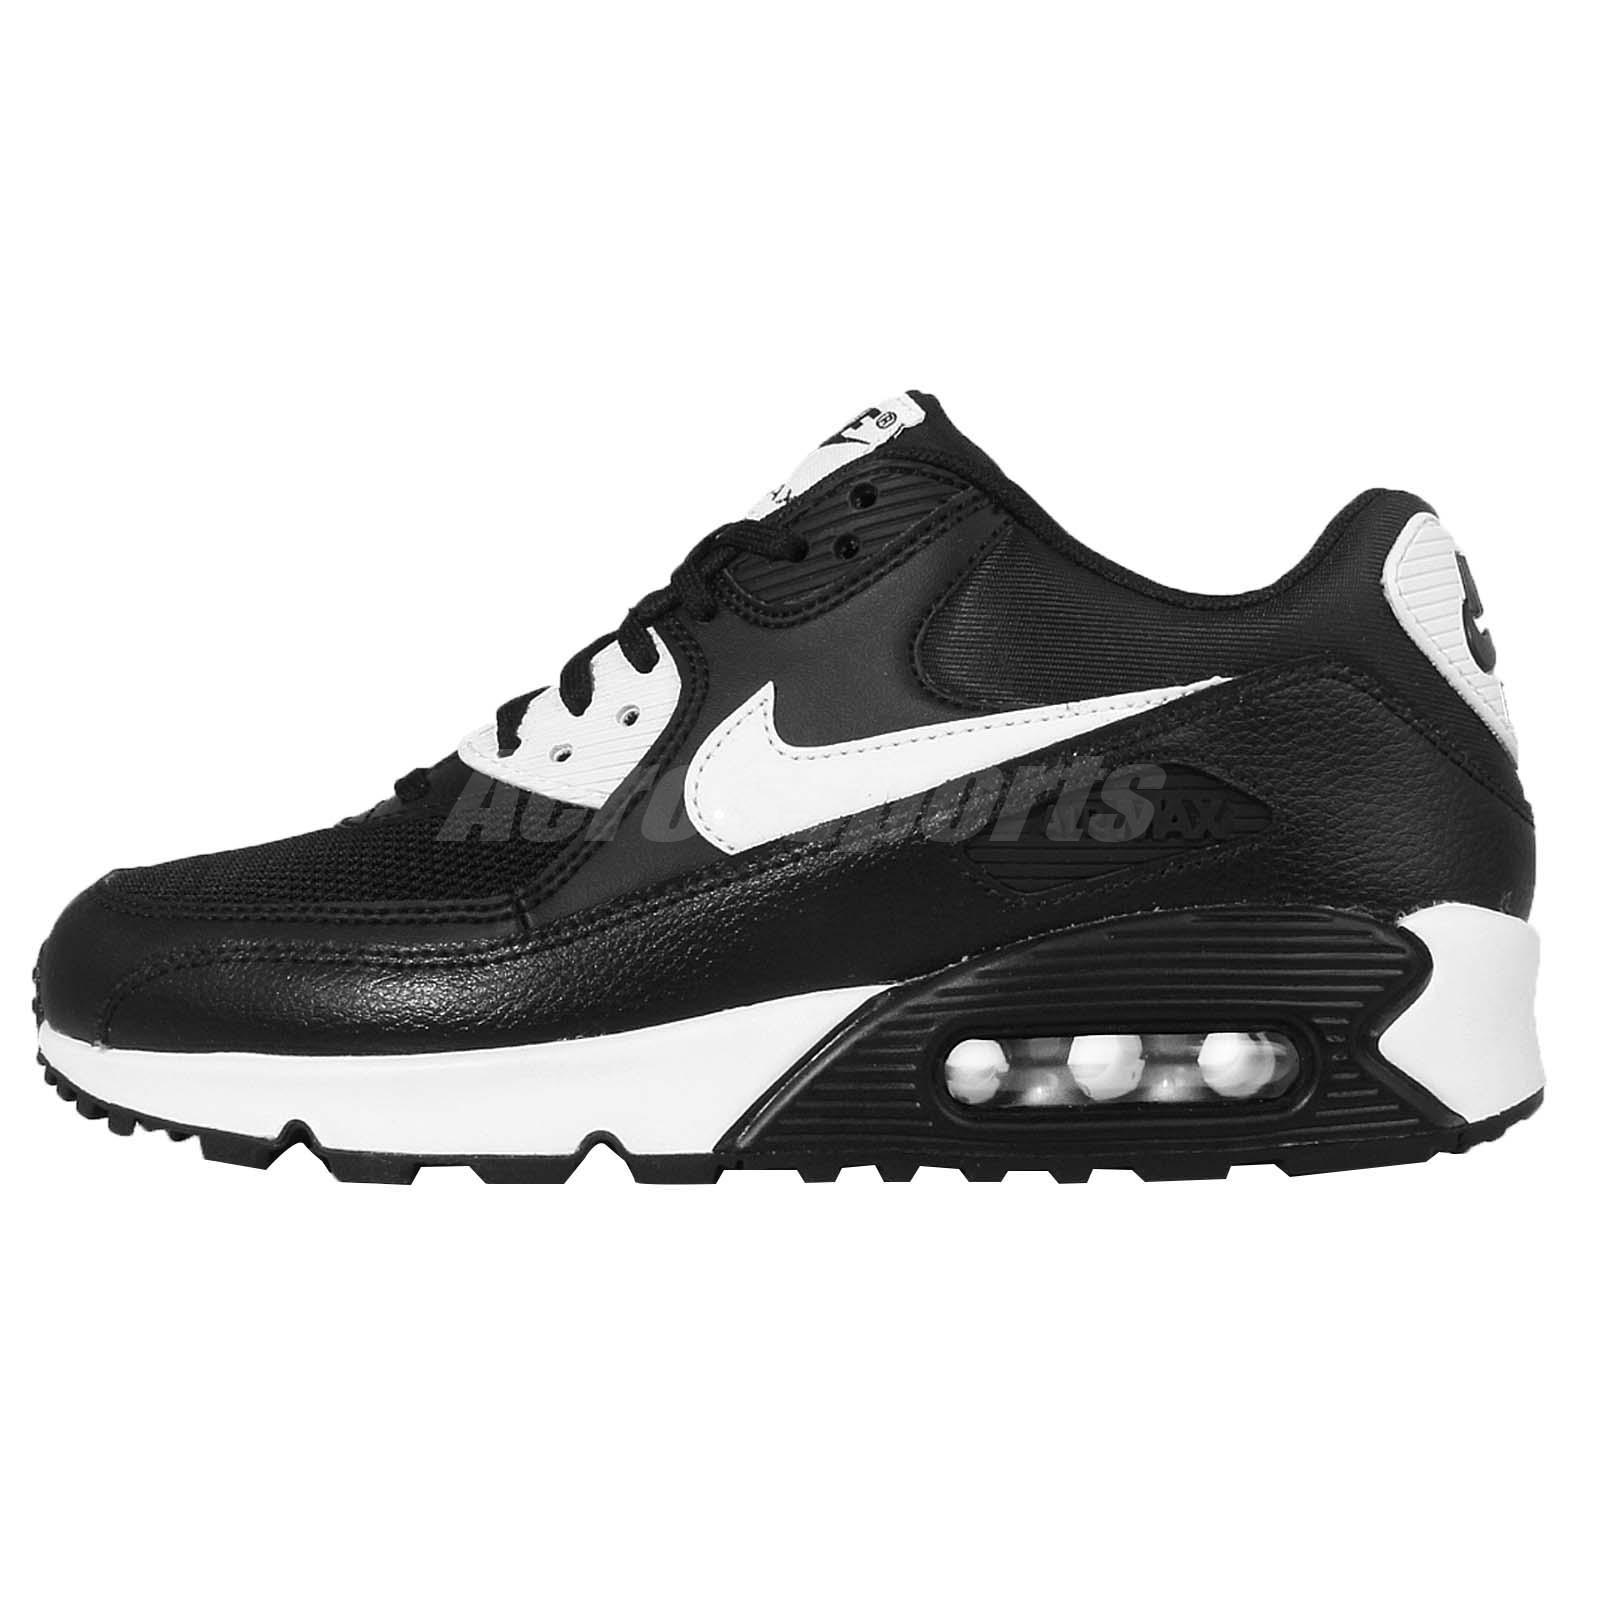 Wmns Nike Air Max 90 Essential Black White NSW Womens Running ...